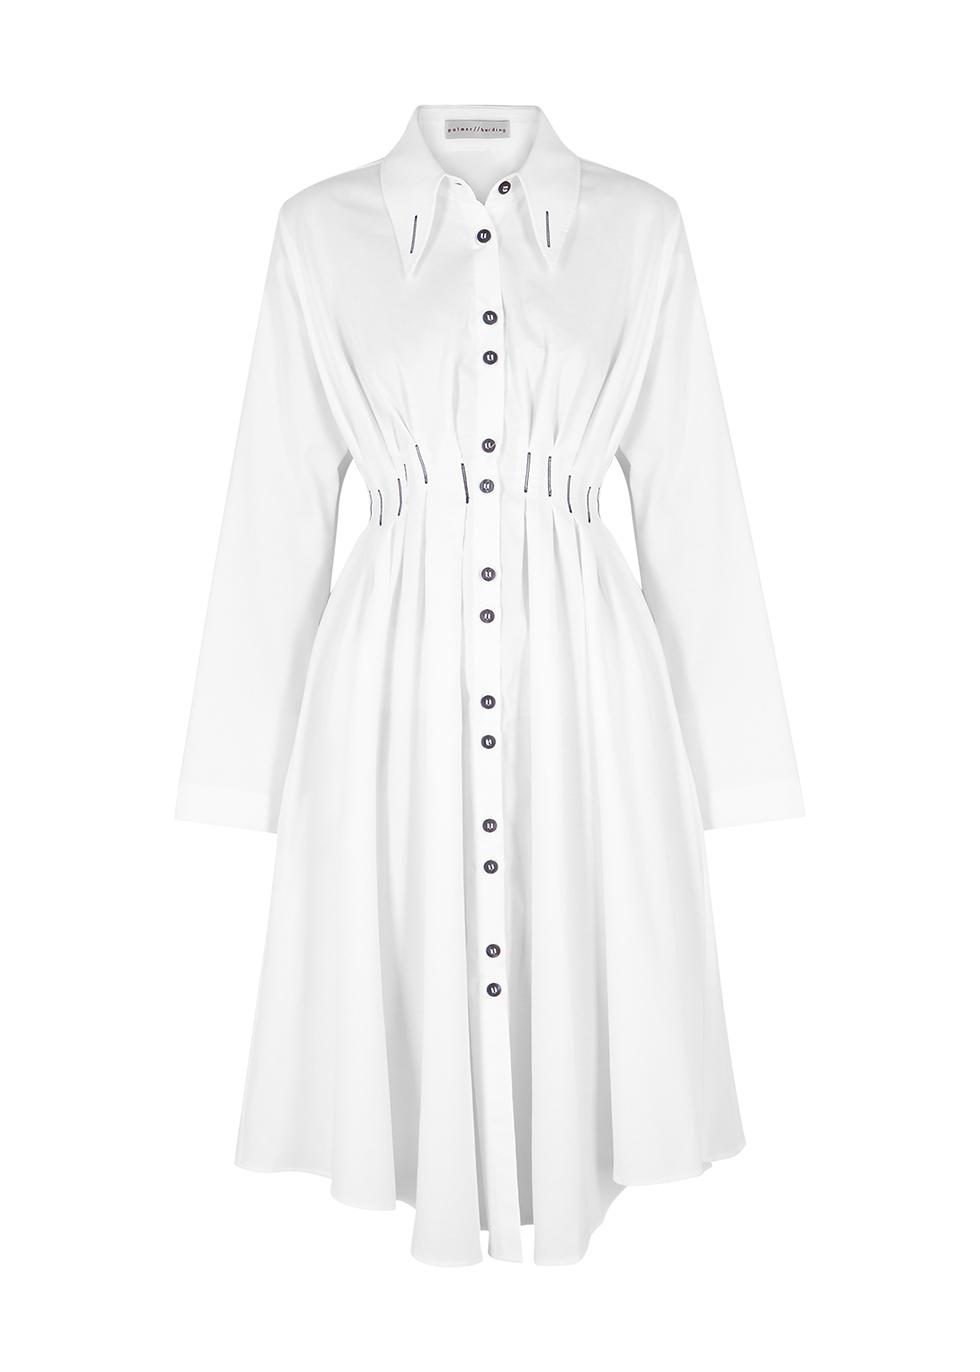 Palmer Harding ESCEN WHITE COTTON SHIRT DRESS